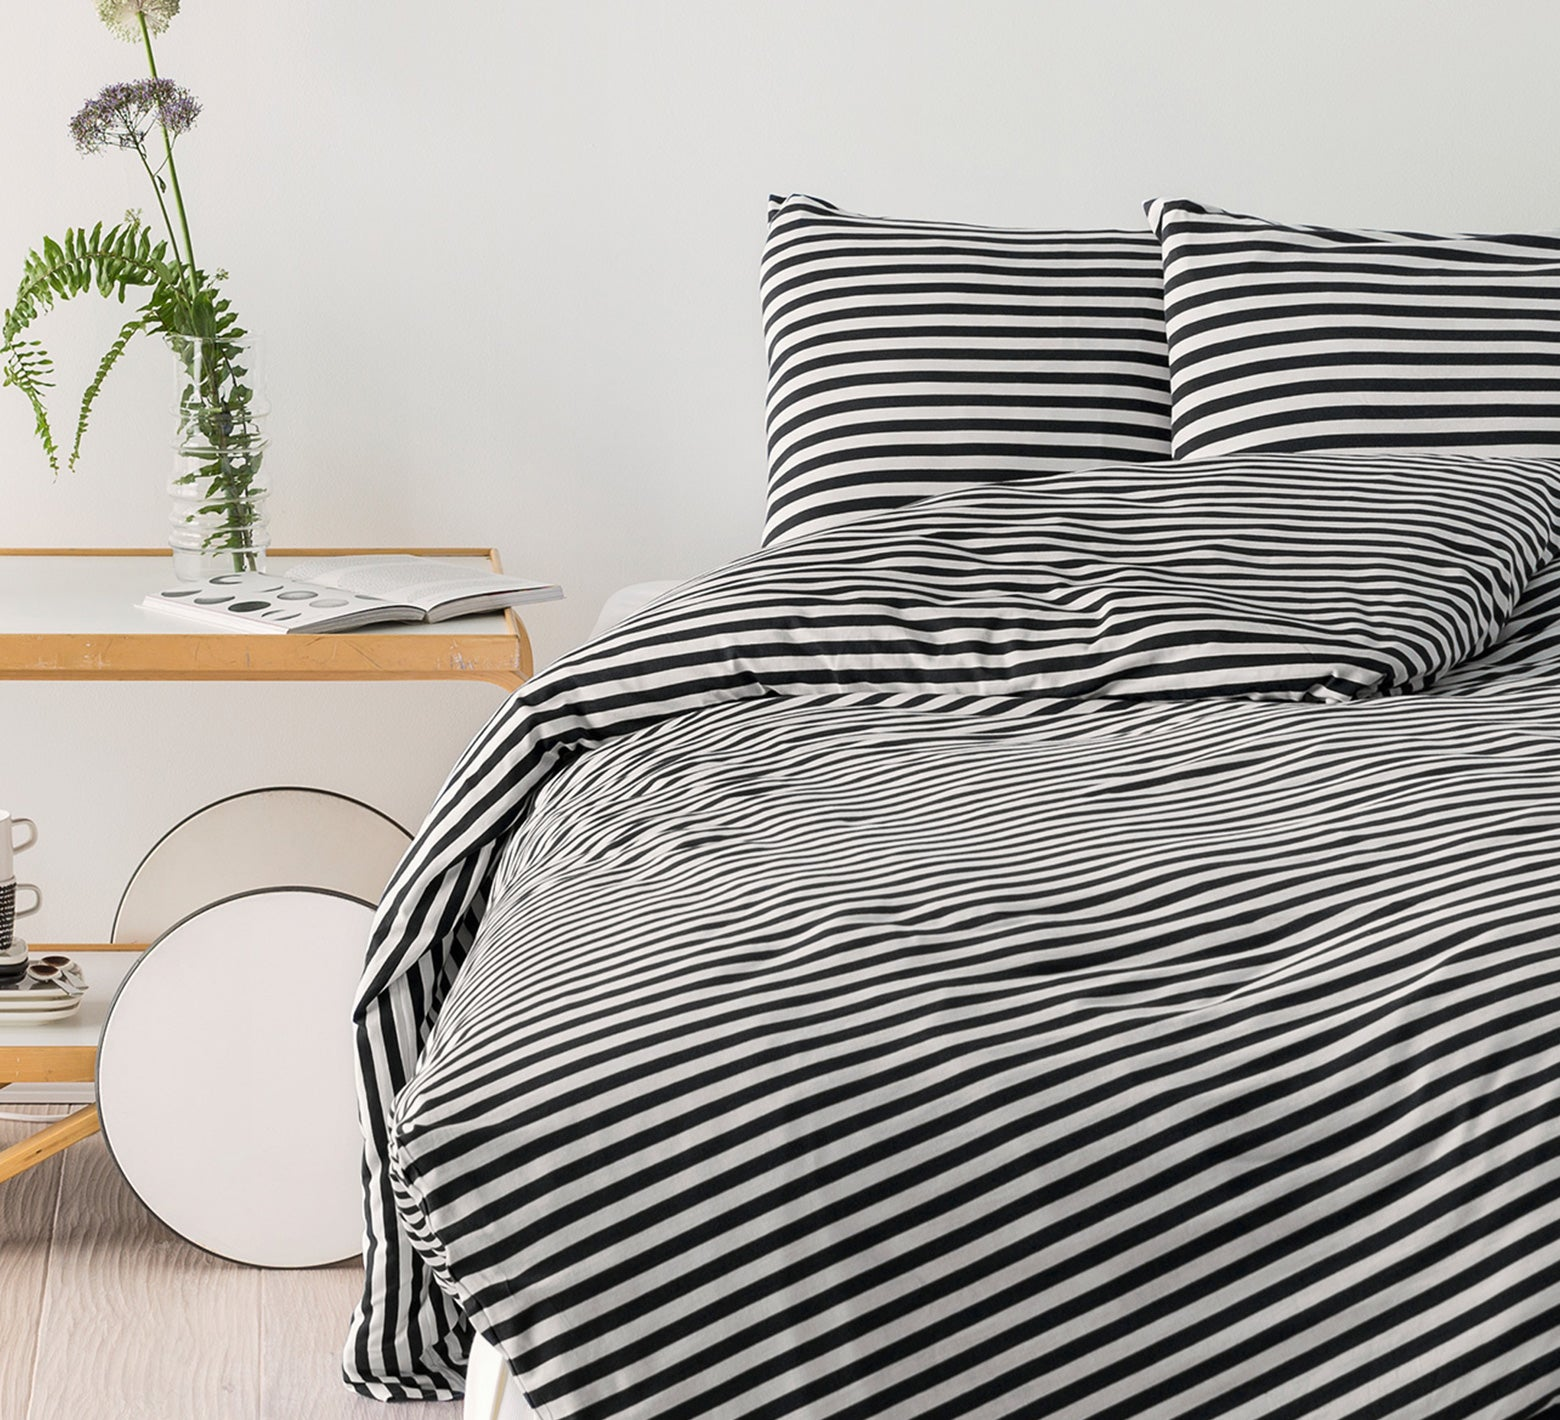 Marimekko bed linens